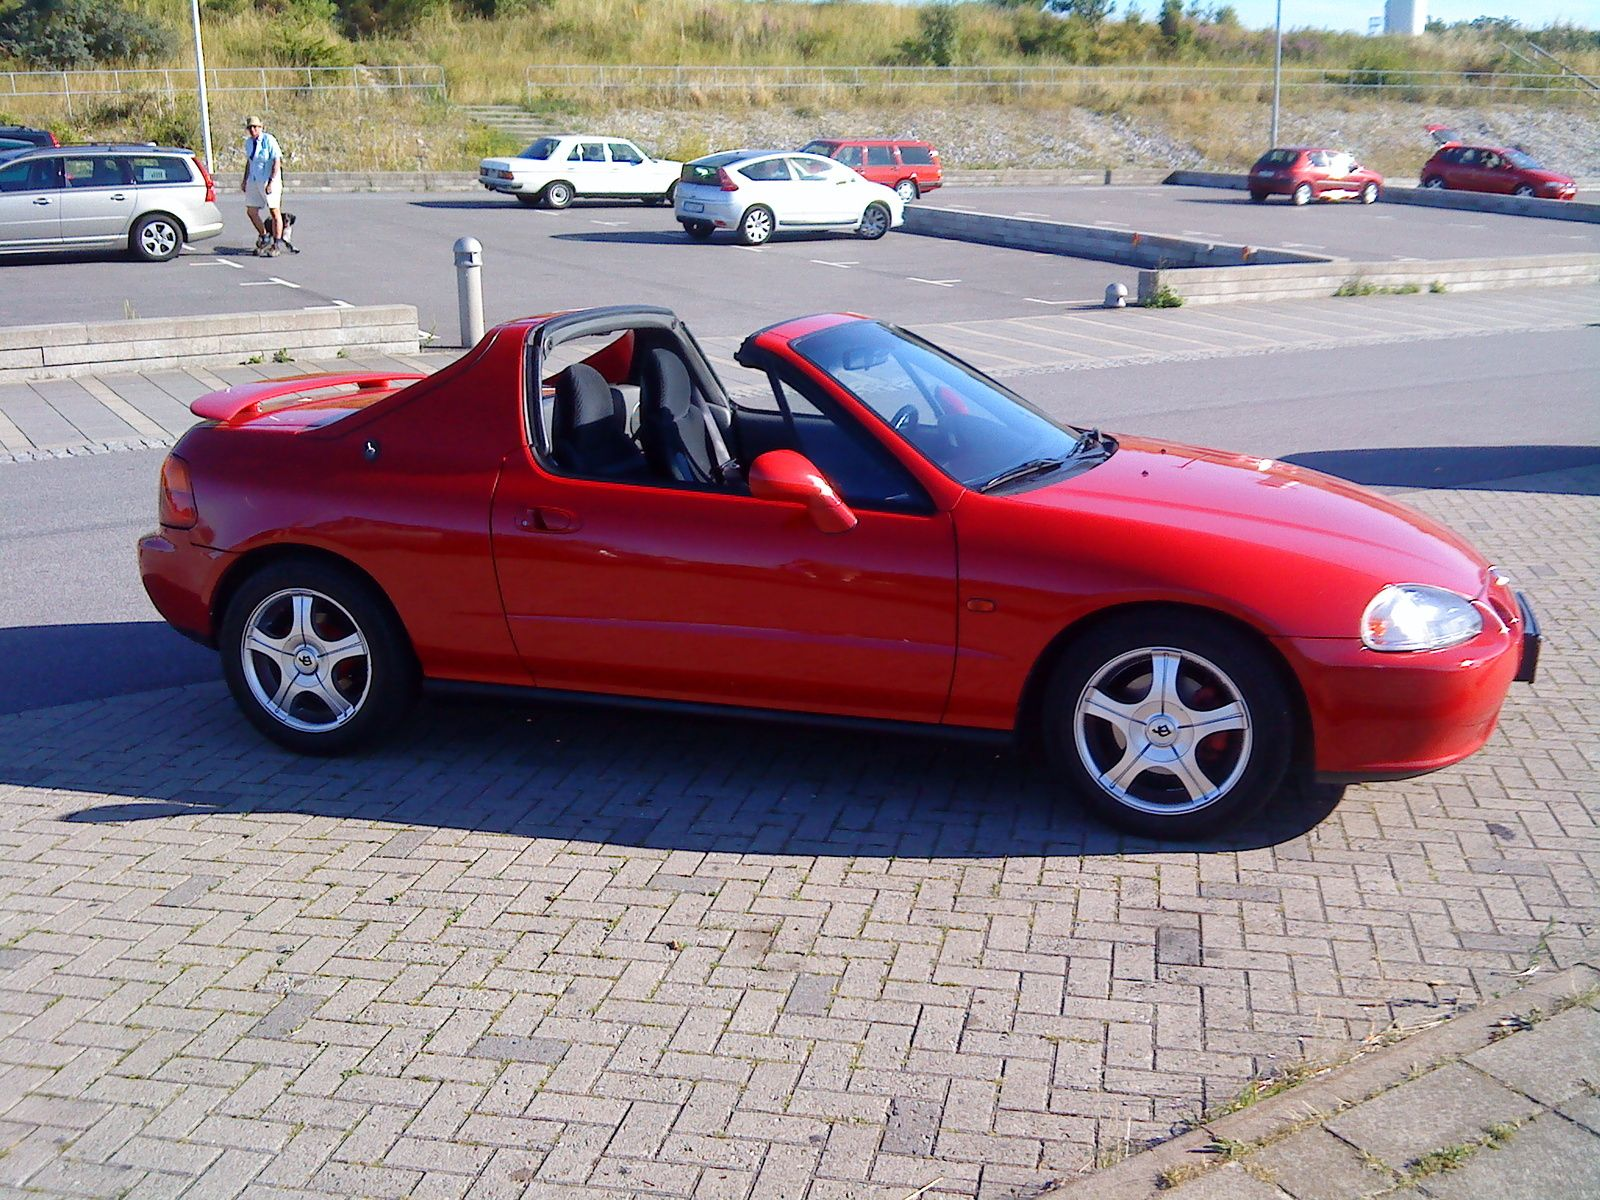 1995 Honda Civic Del Sol Pictures Cargurus Honda Civic Honda Honda Del Sol